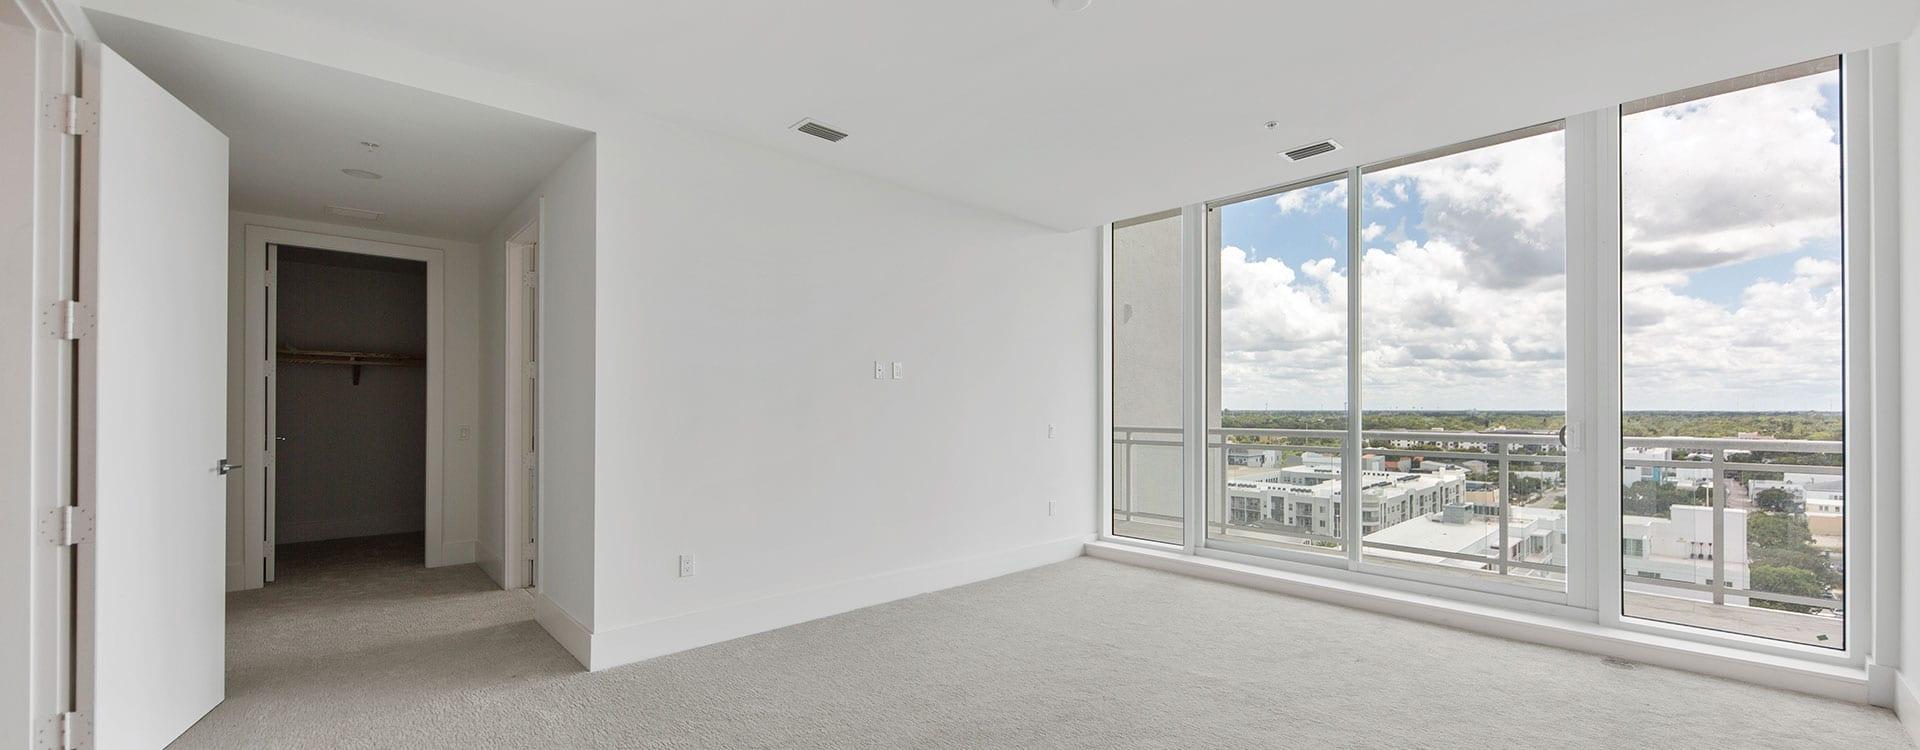 BLVD Sarasota Residence 1102 Bedroom looking out to downtown sarasota